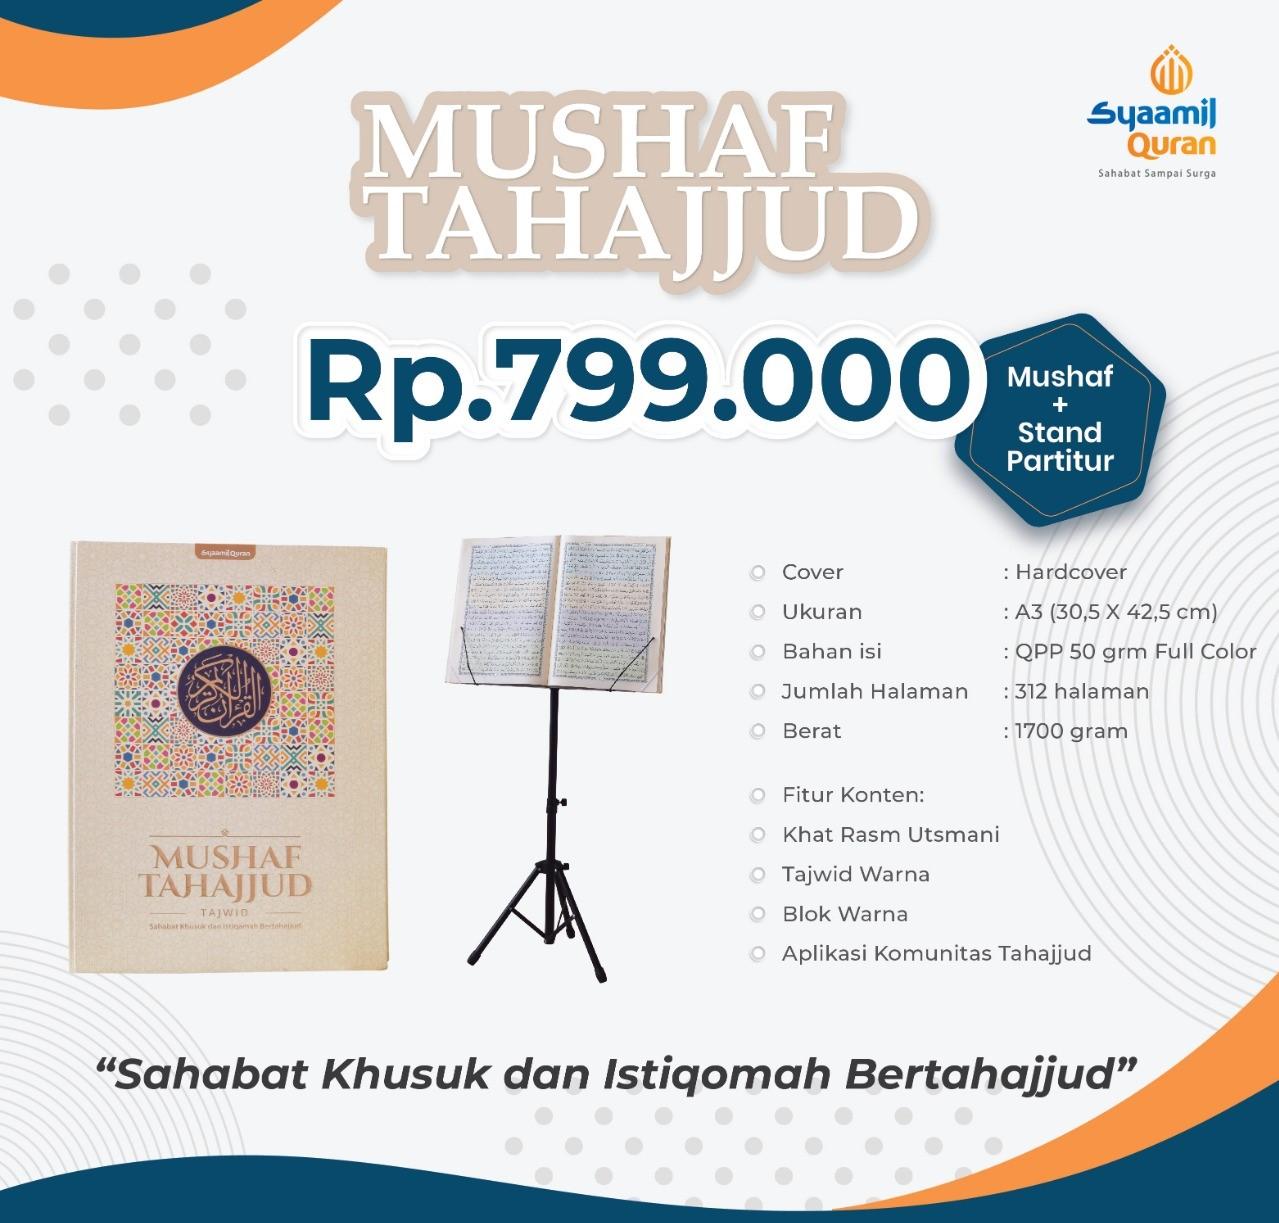 Al-Quran Mushaf Tahajjud Ukuran A3 Plus Stand Partitur